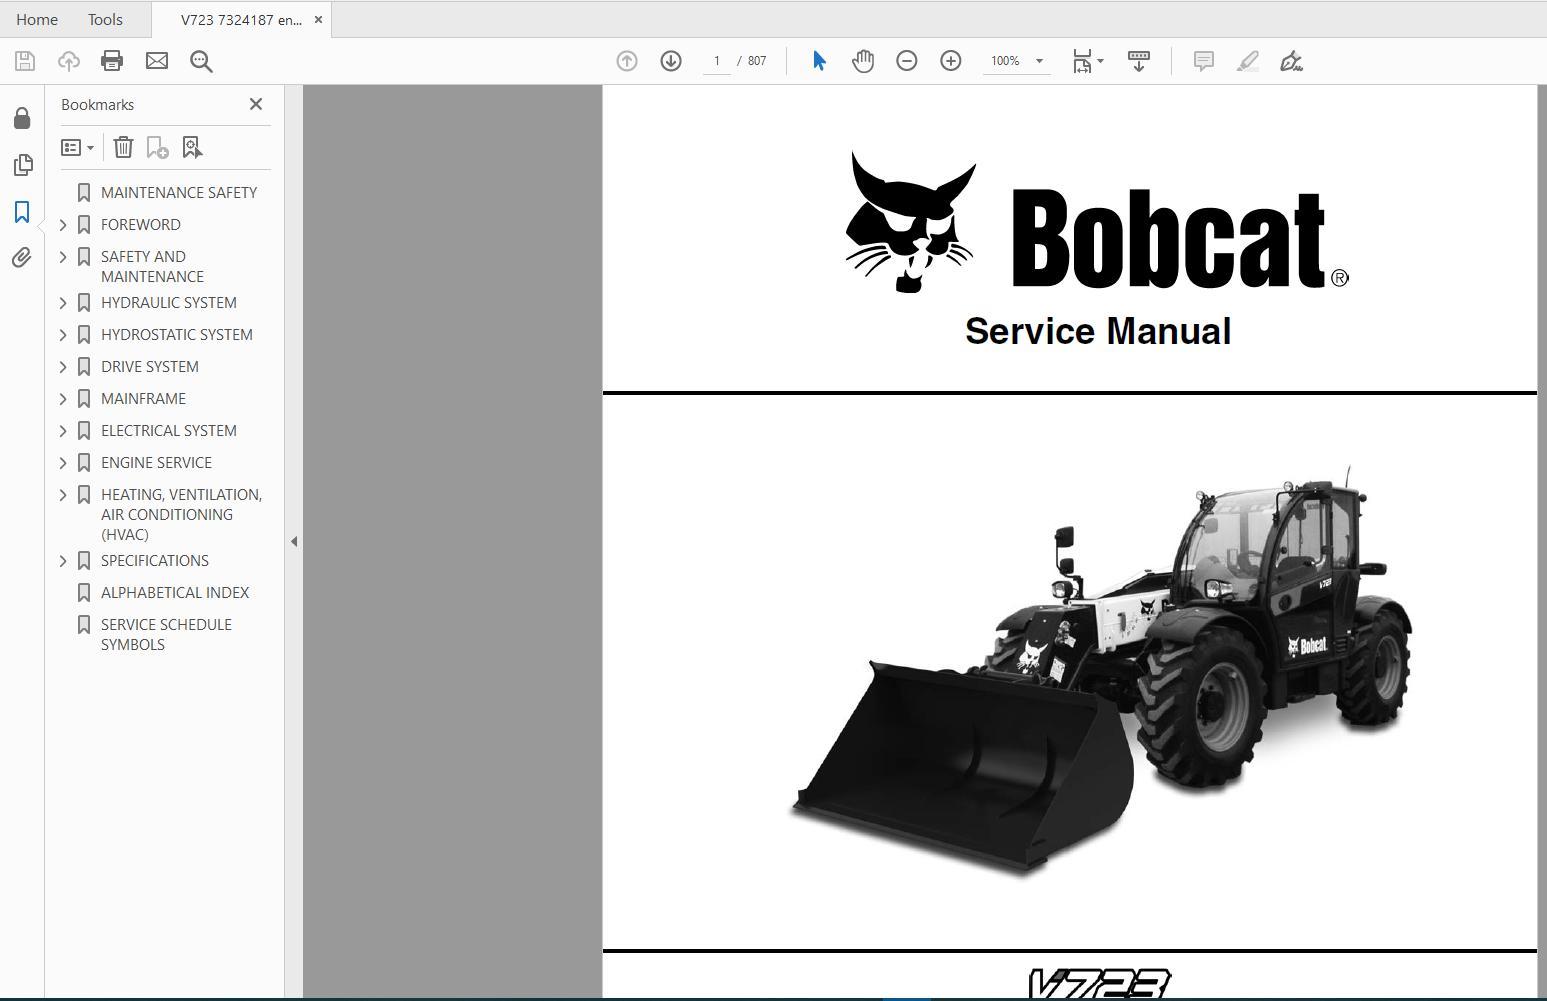 Bobcat_Versa_HANDLER_TTC_Telescopic_Handler_Service_Library_2017_DVD8